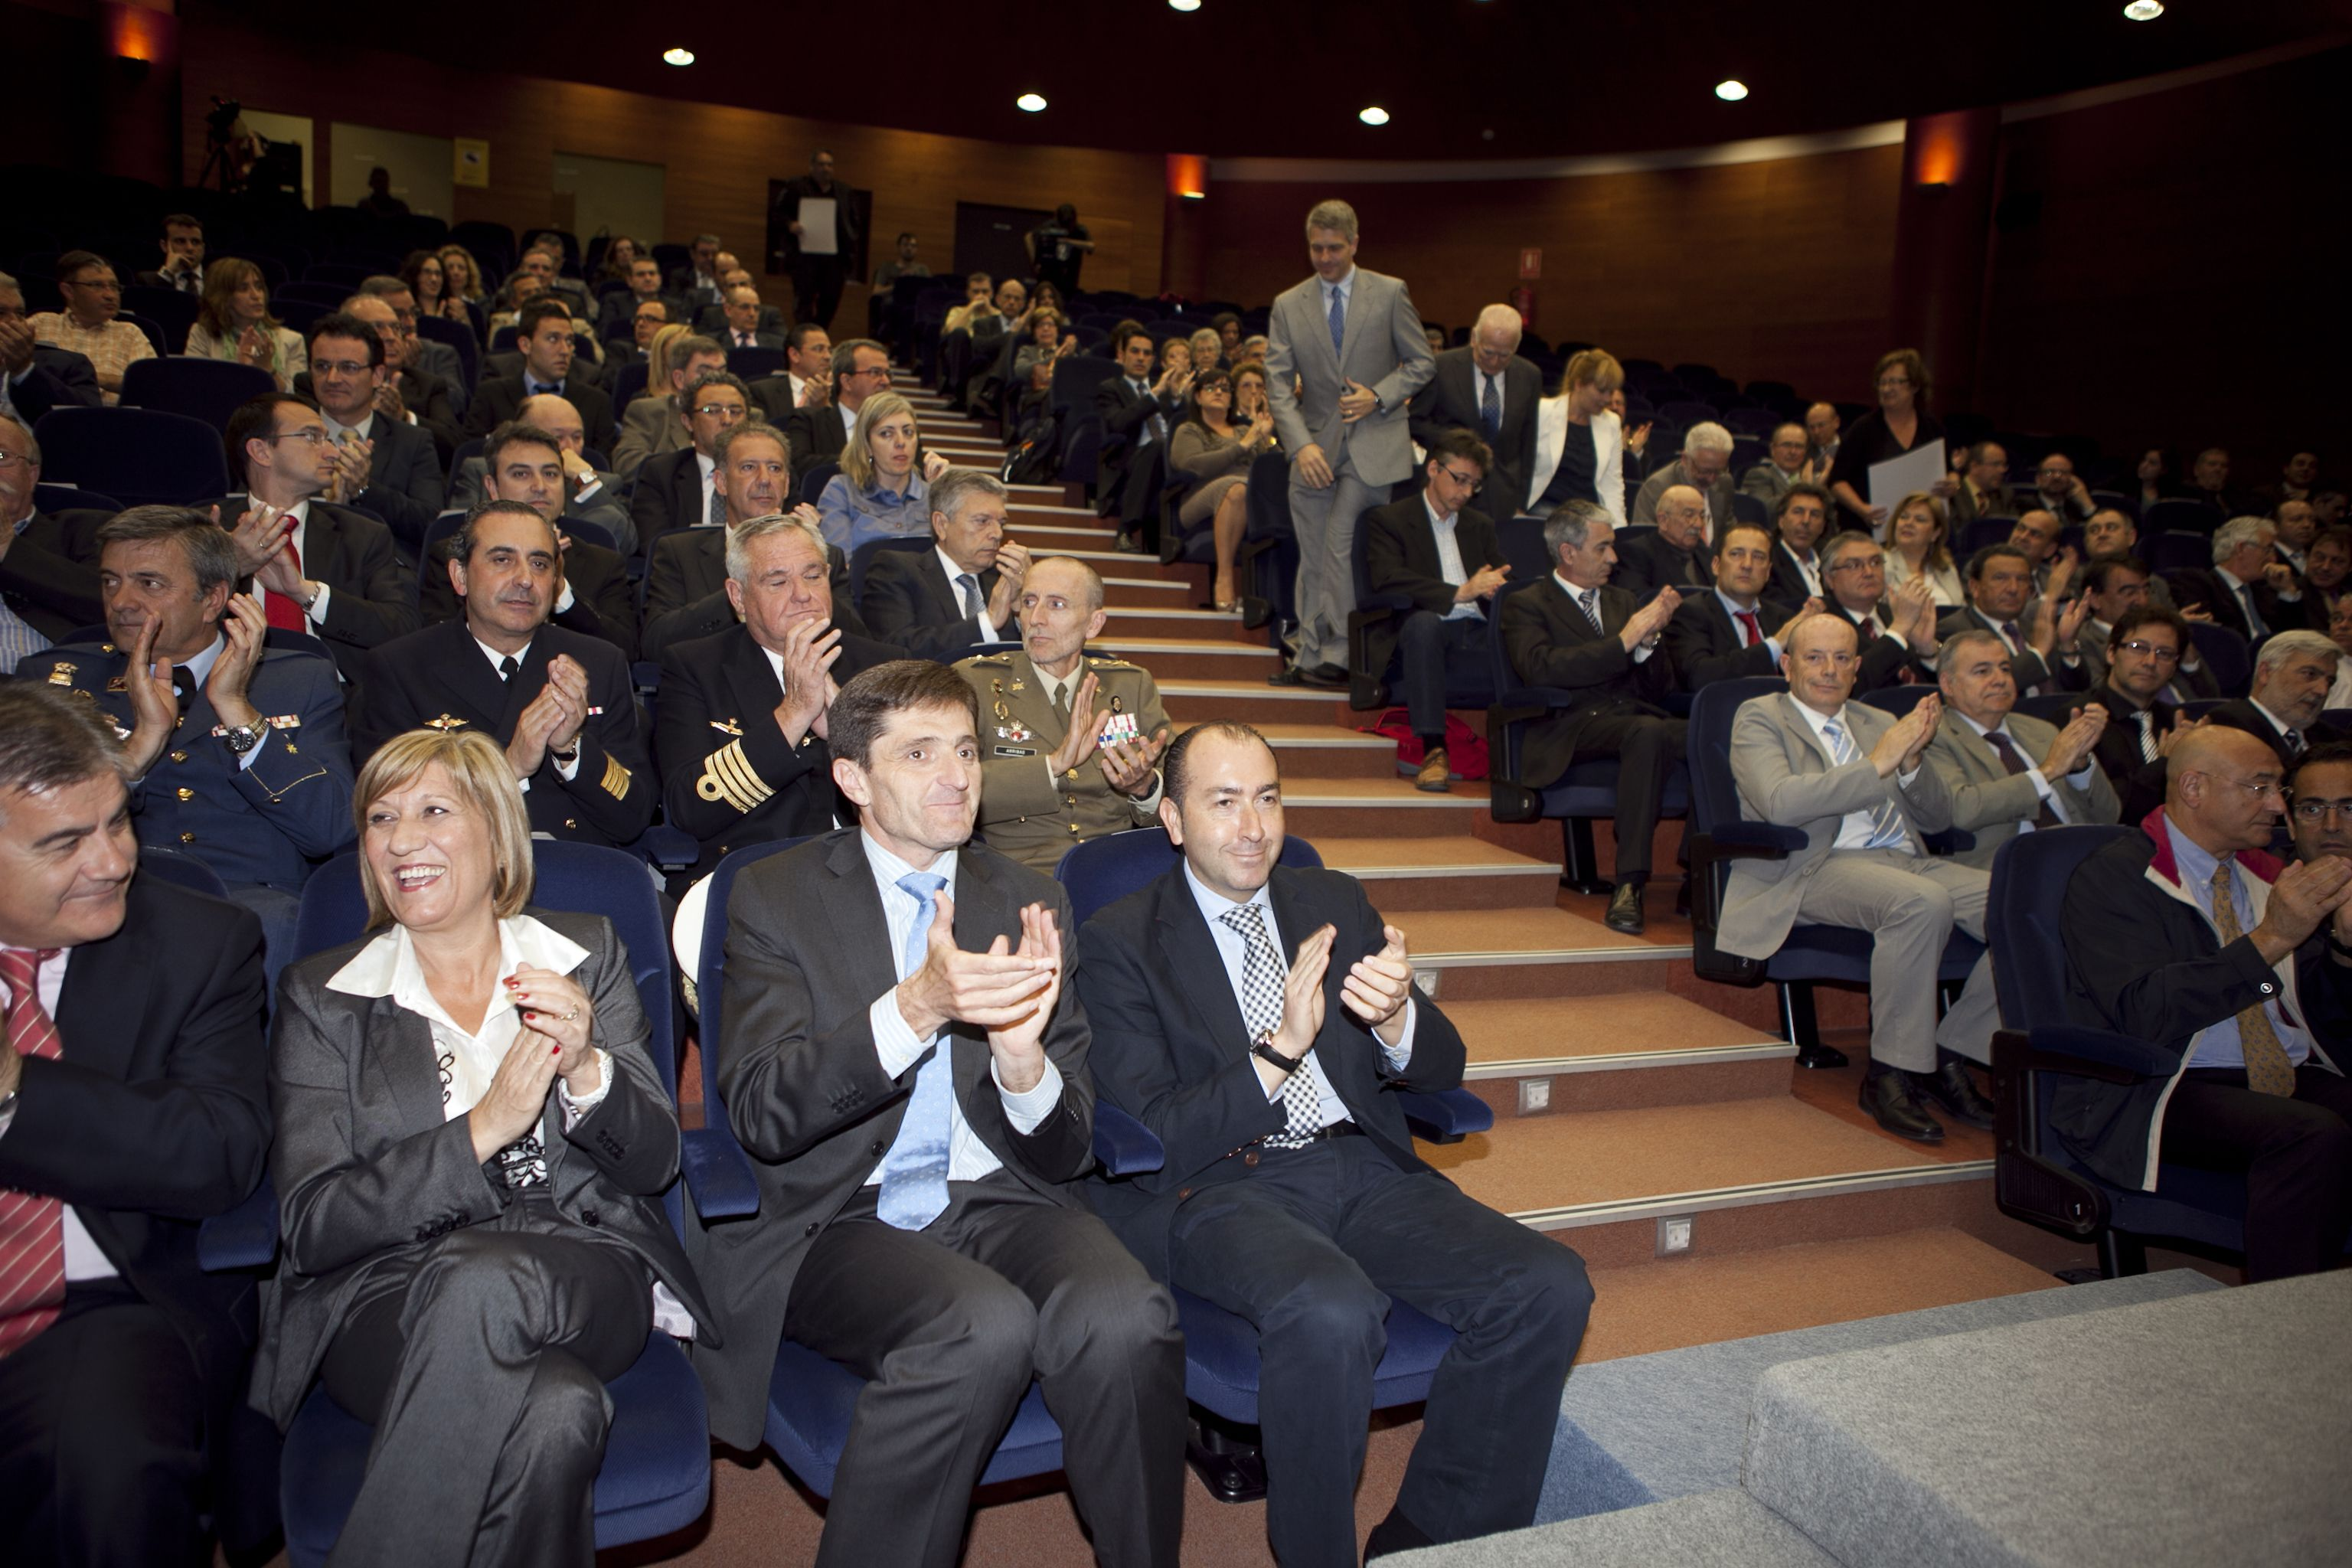 umh-diplomas-rector_mg_6552.jpg